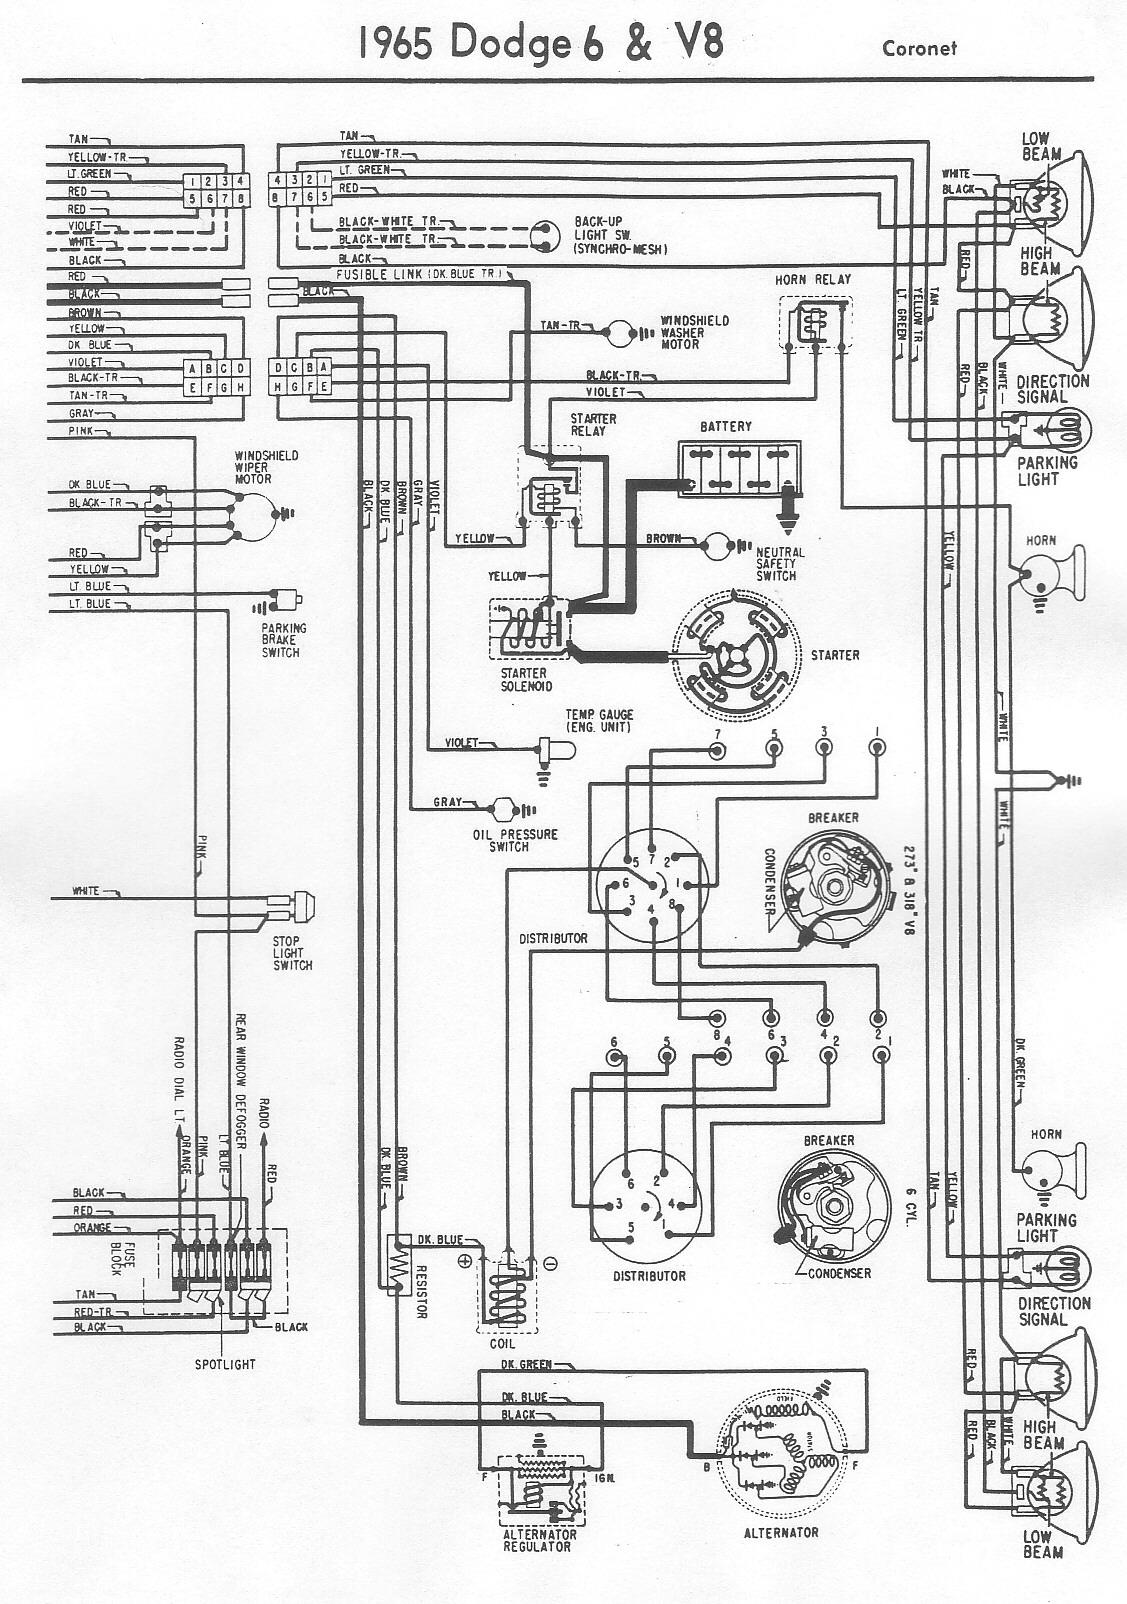 medium resolution of 1967 dodge alternator wiring wiring diagrams source67 dodge ignition wiring diagram automotive wiring diagrams dodge caravan